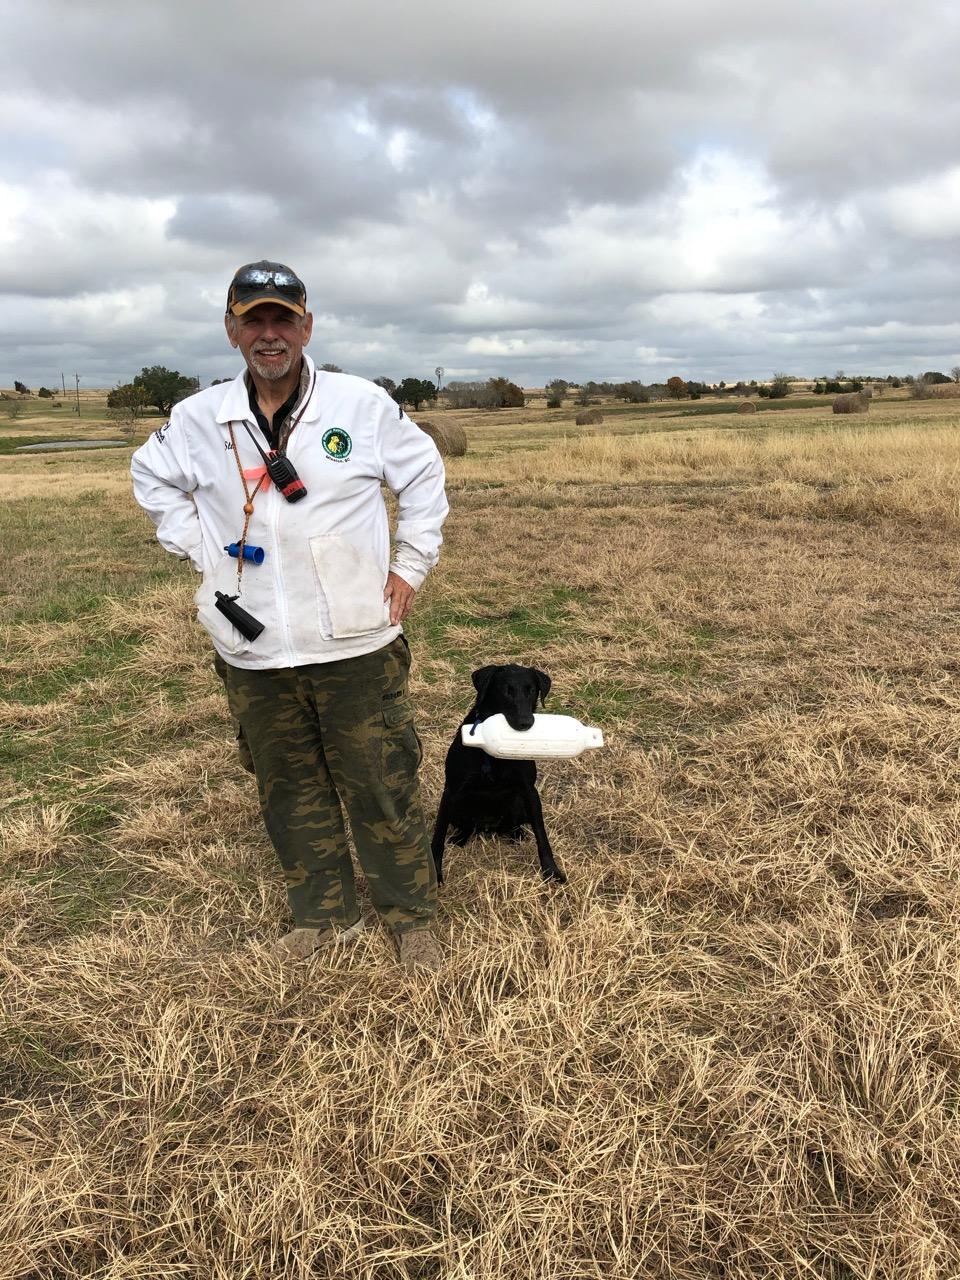 Stu Mead Club Mead Labradors standing in field with Black Labrador Retriever